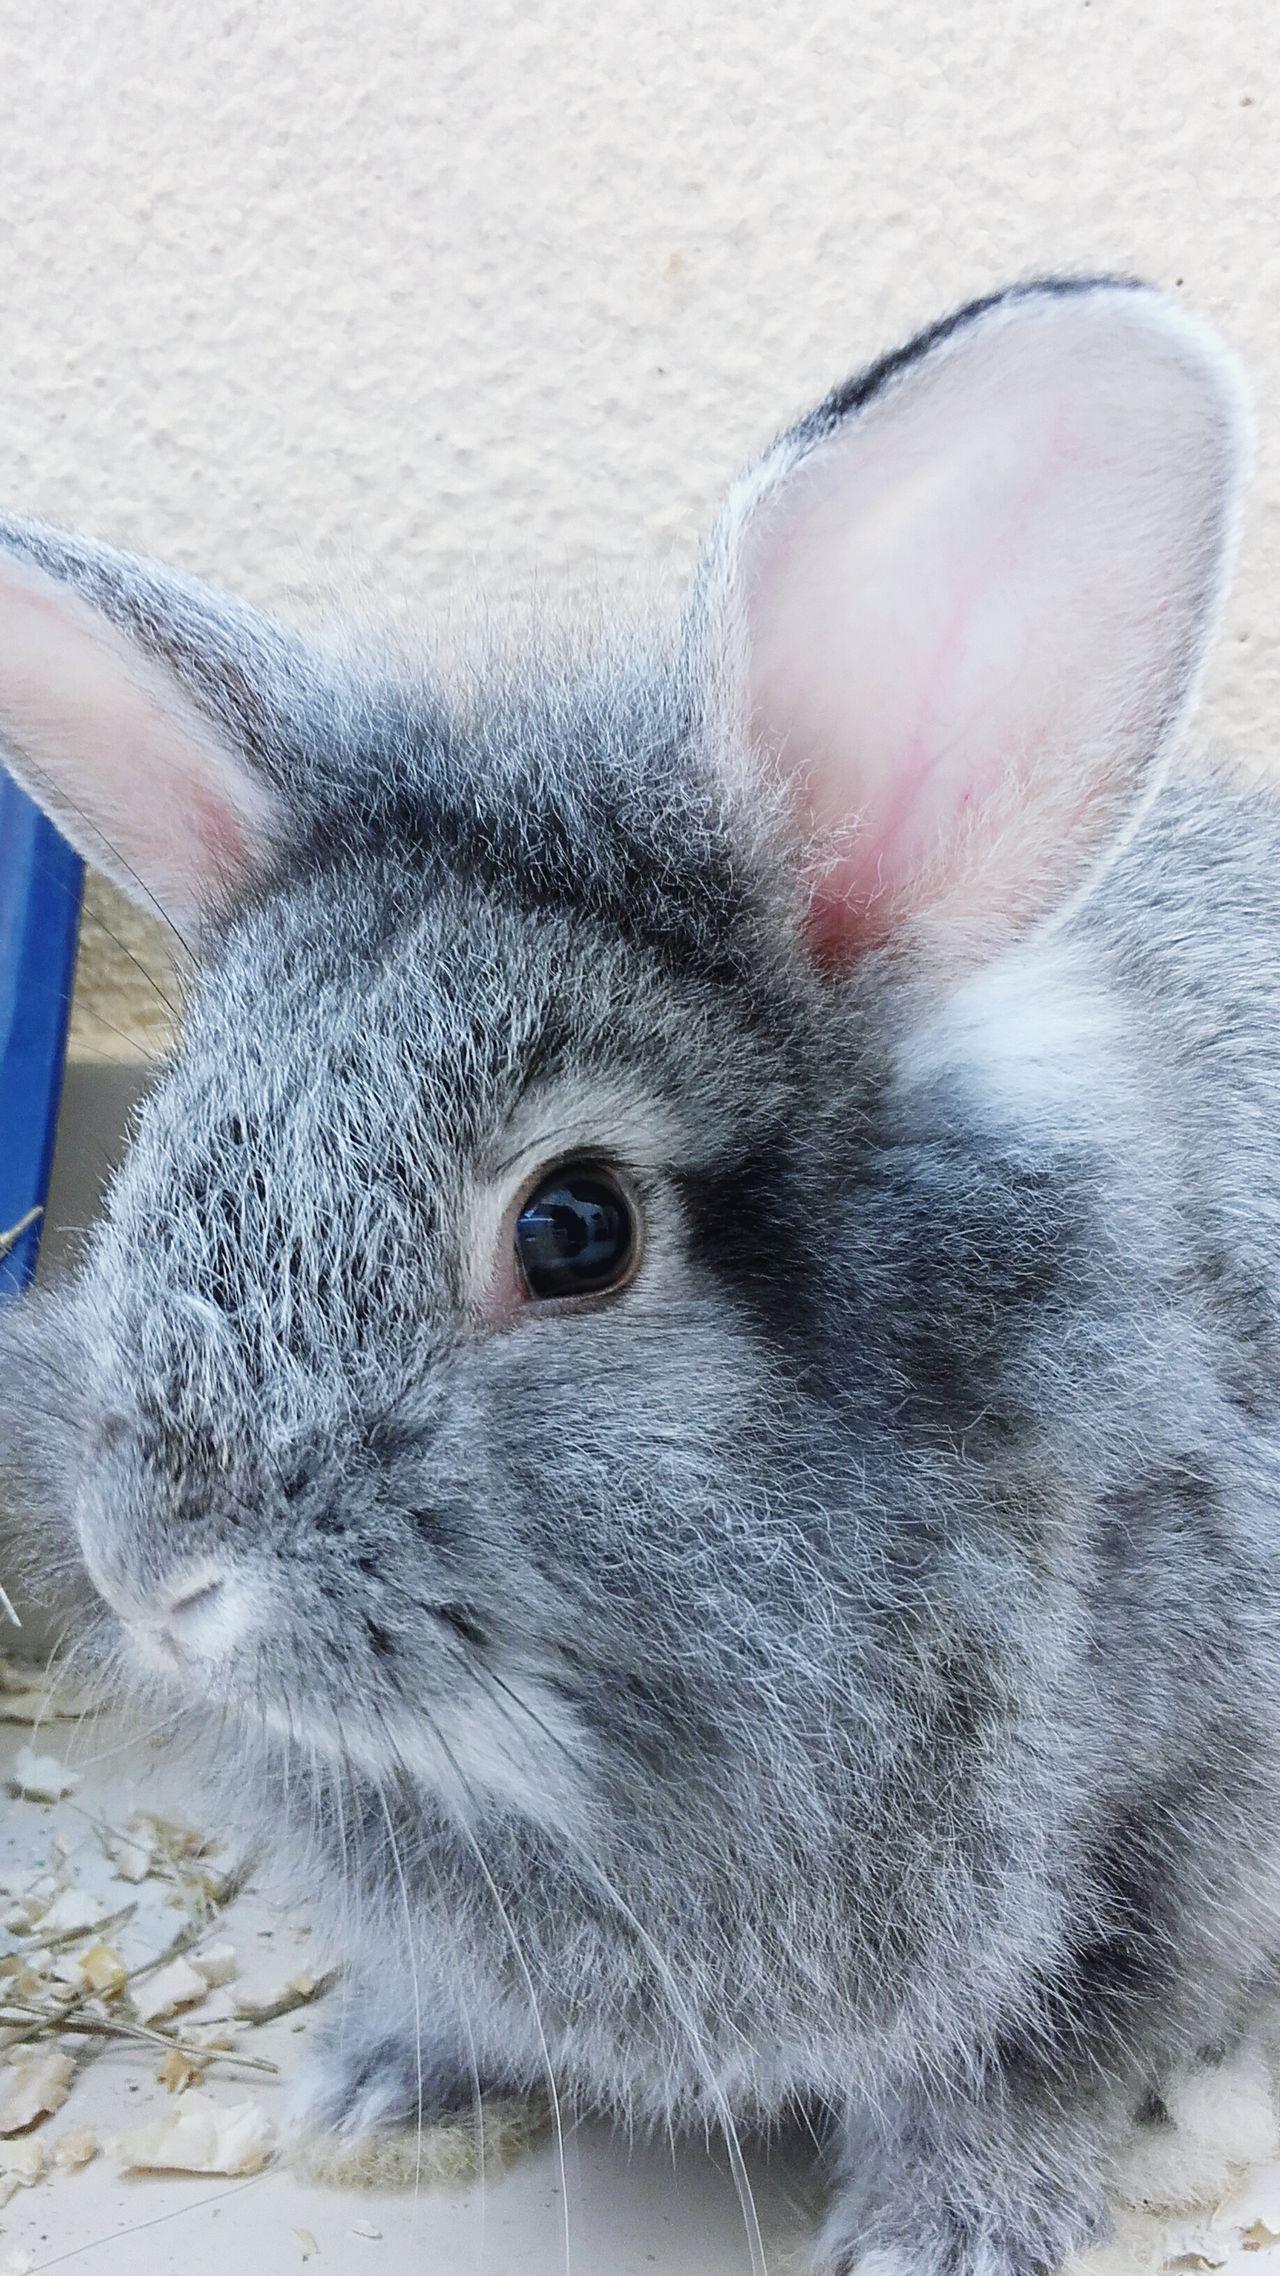 Rabbit ❤️ Rabbits 🐇 Rabbits Animals Animal_collection